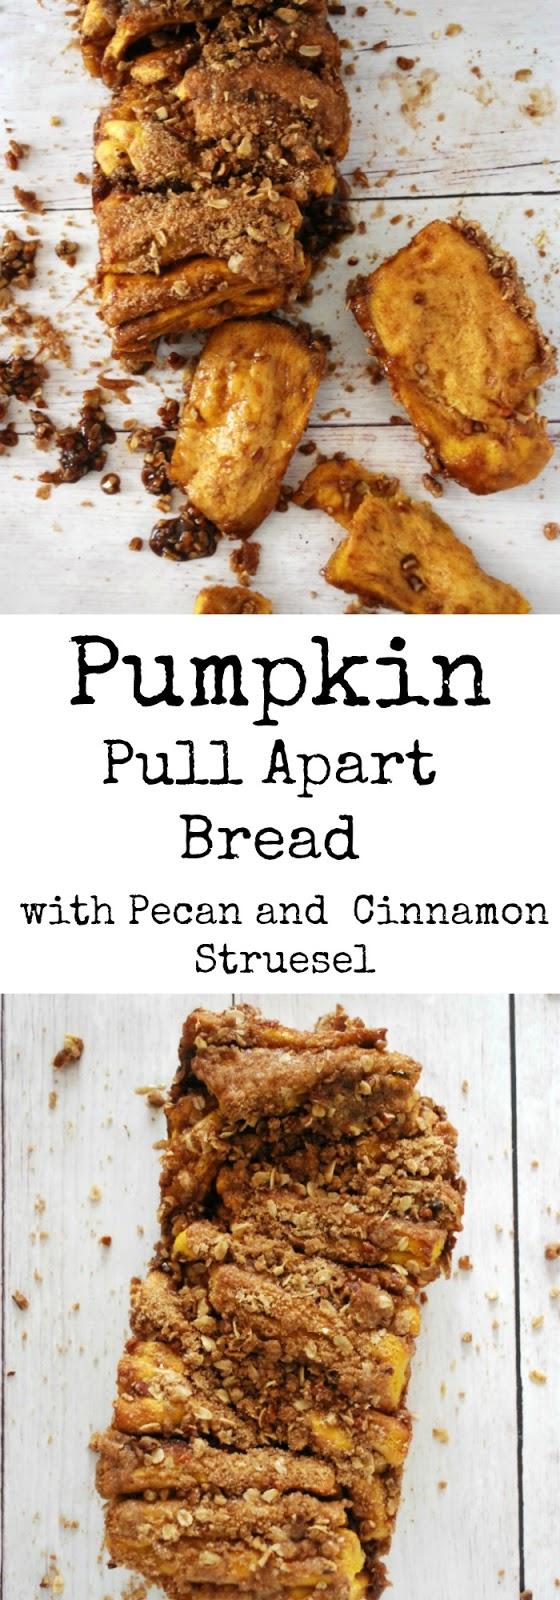 Pumpkin Pull Apart Bread with Pecan Cinnamon Sugar Streuse